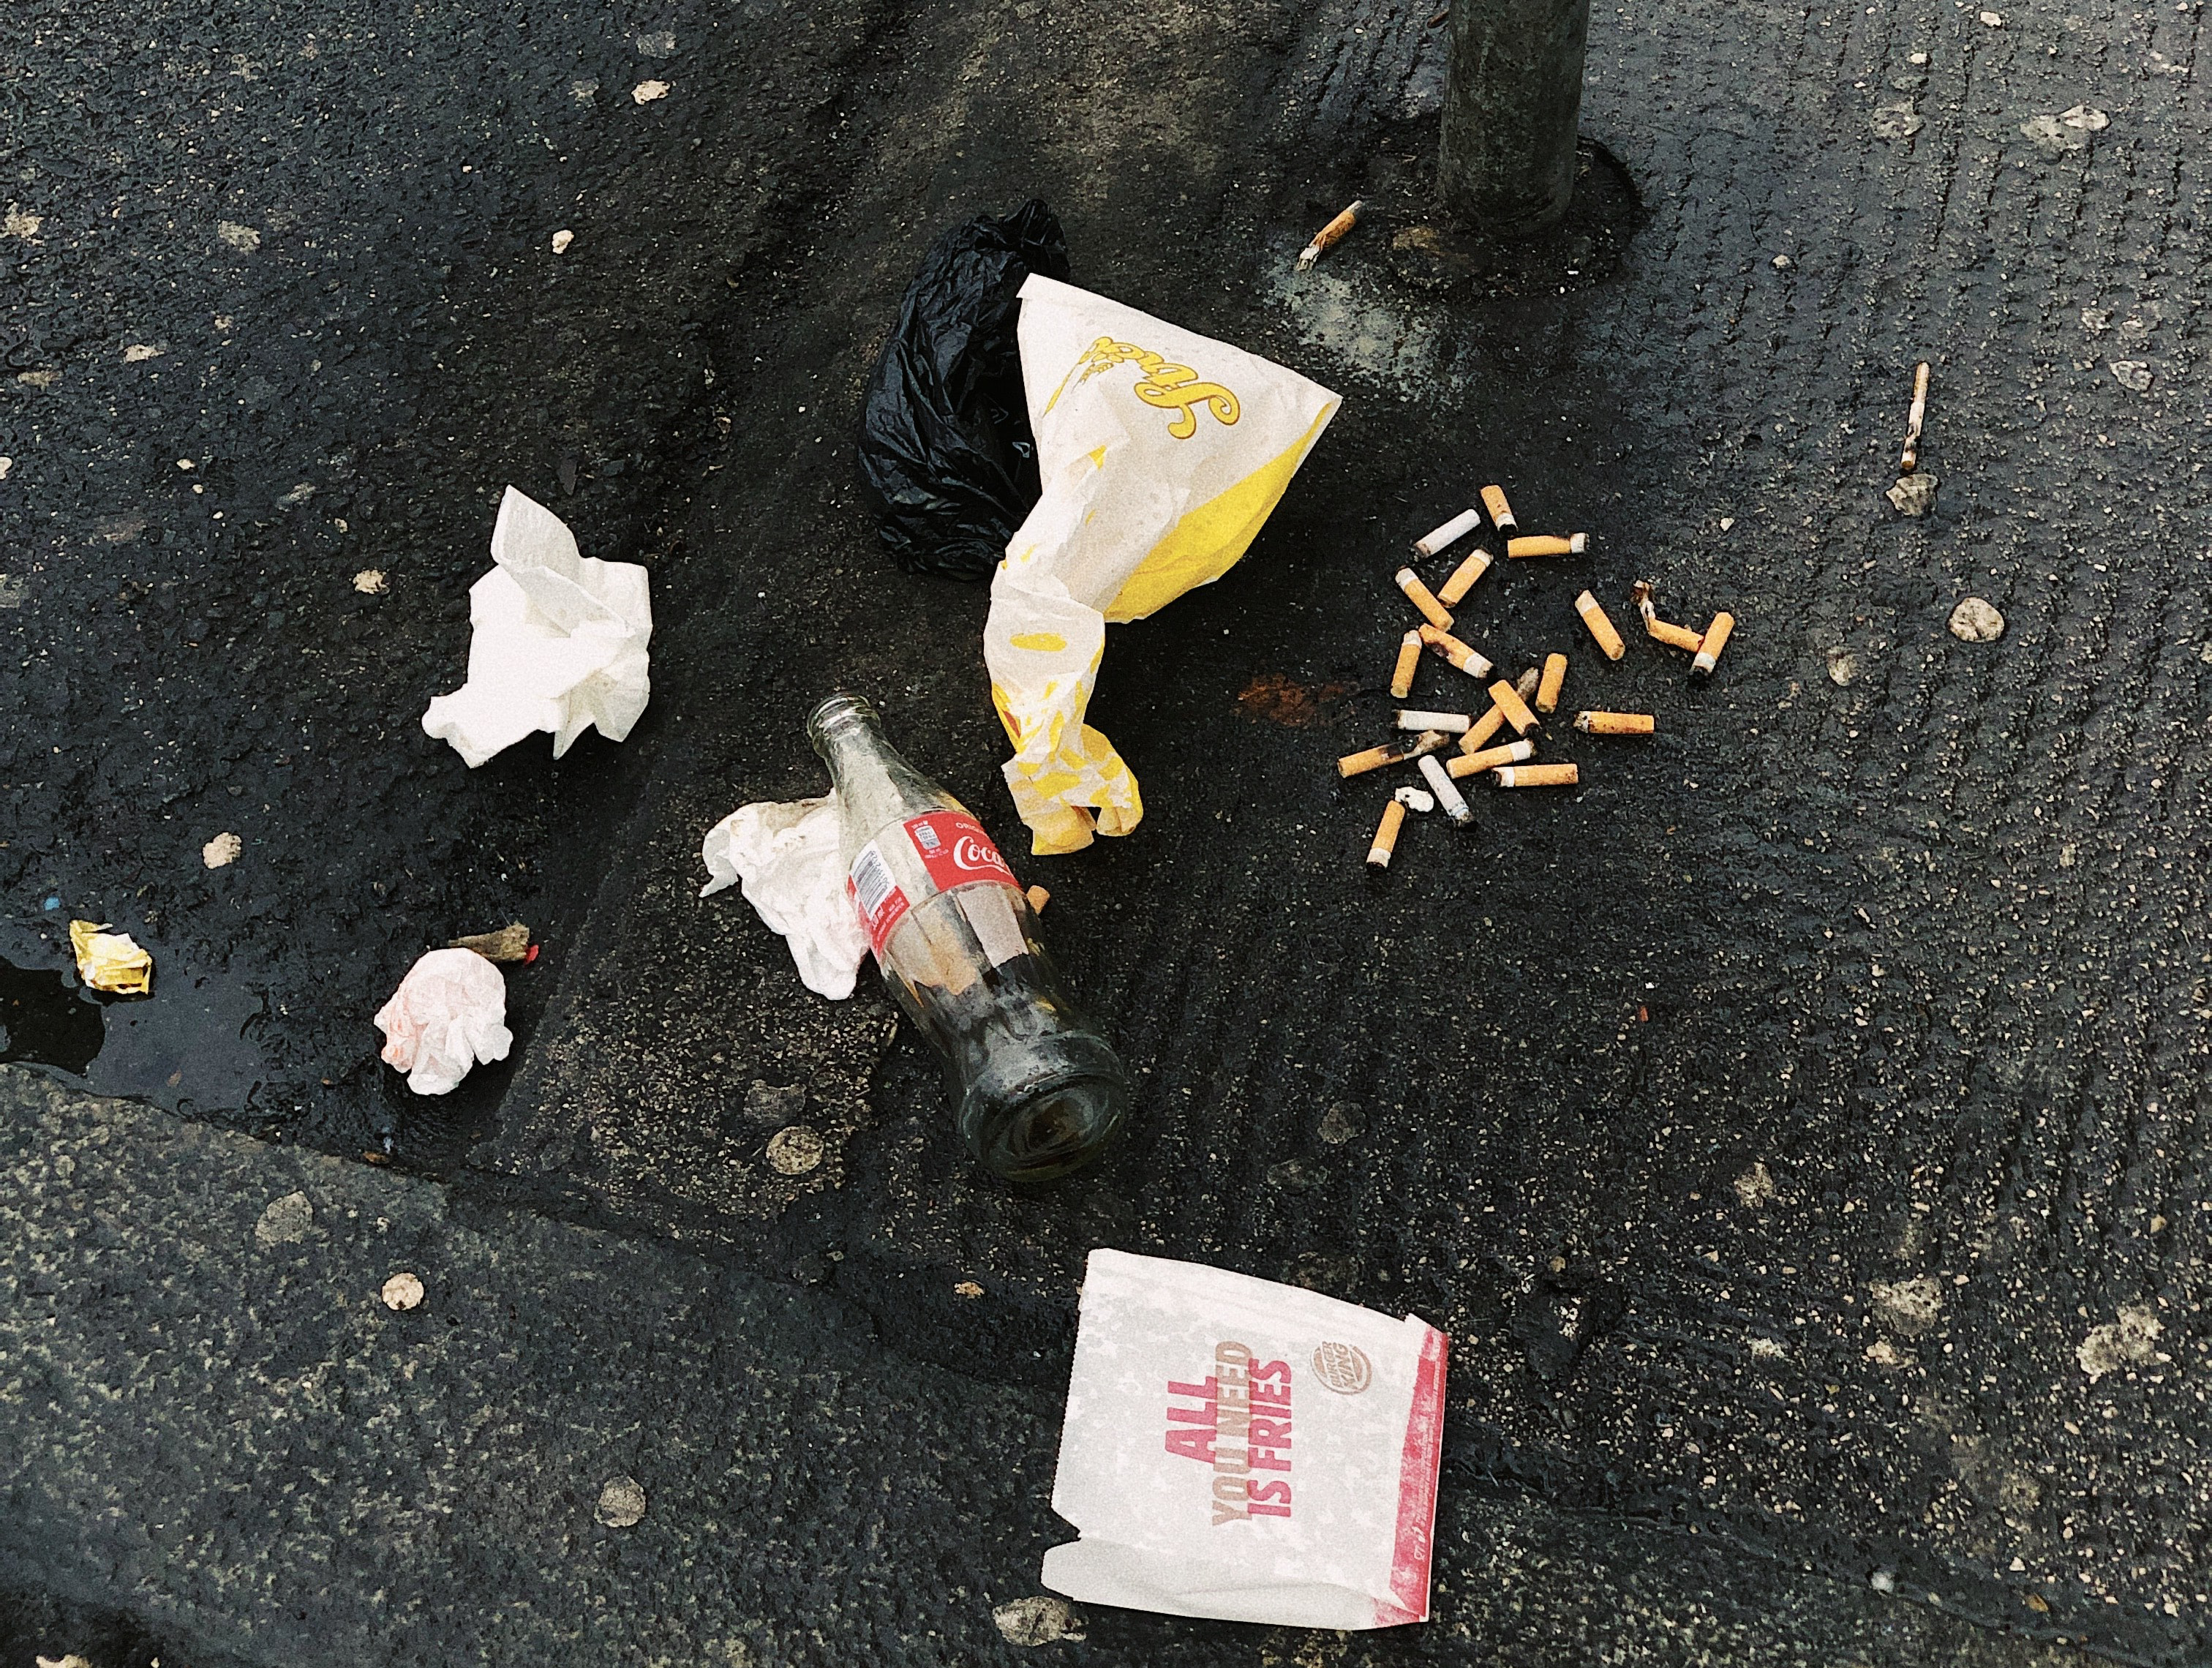 rot på bakken, fries, chips, cola flaske, søppel, papir, tyggis